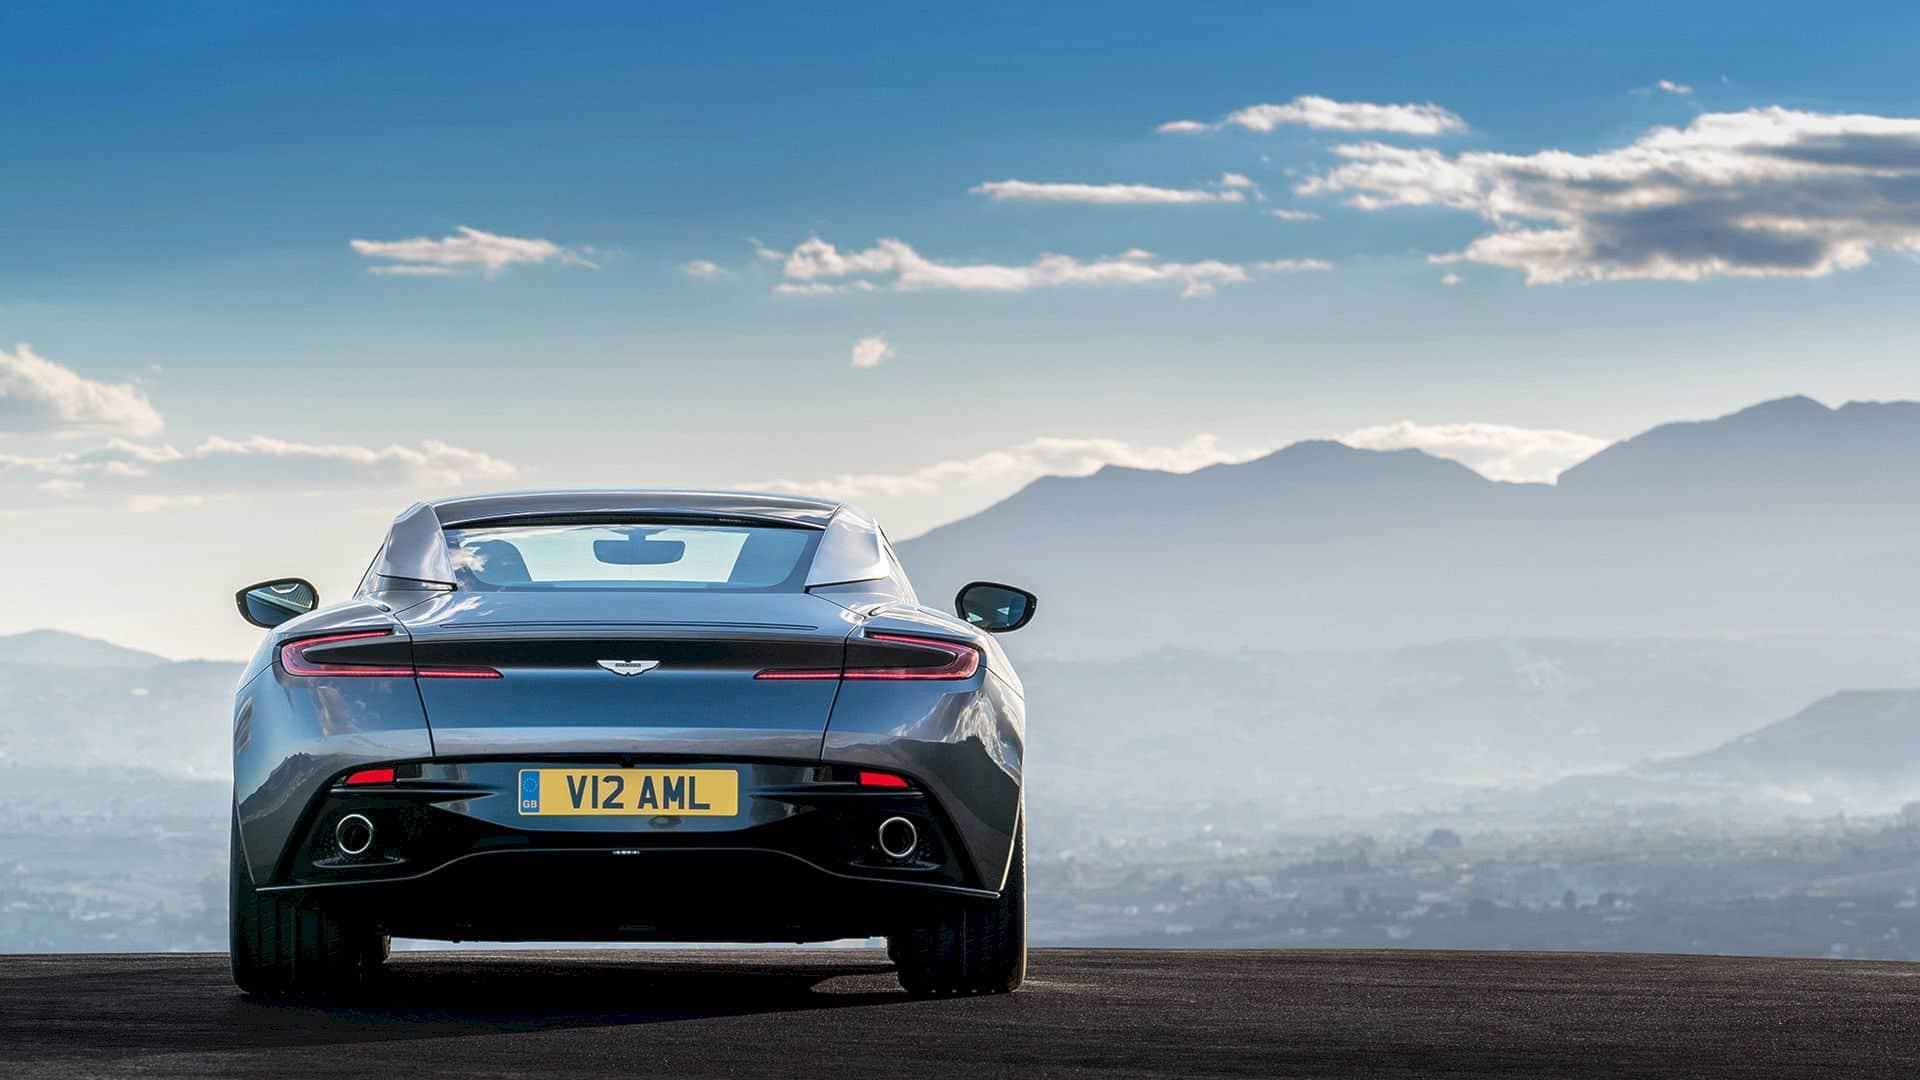 Aston Martin Db 11 7